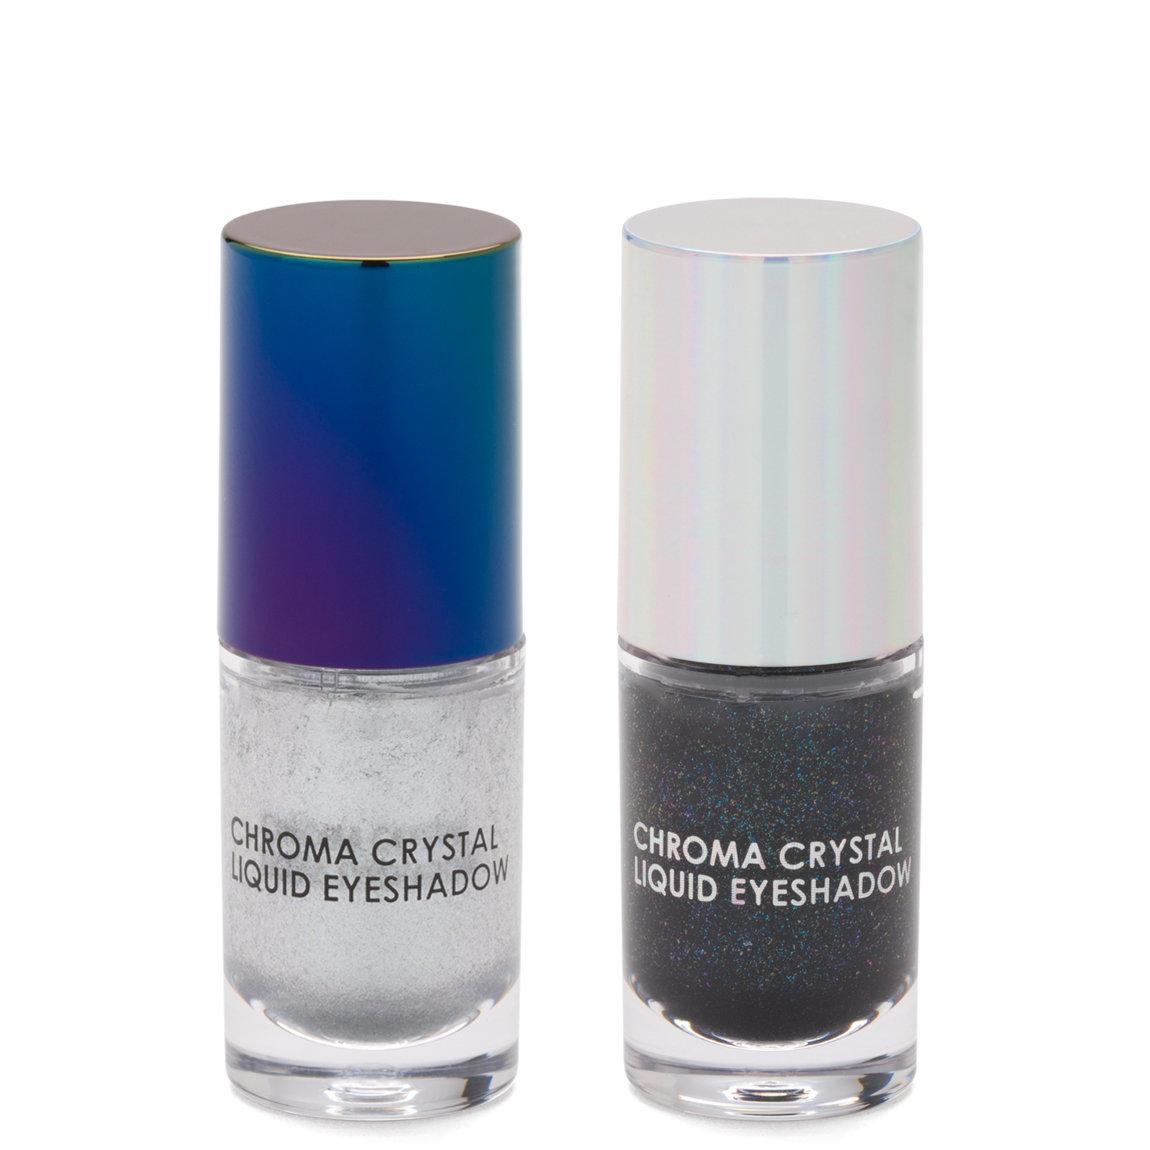 Natasha Denona Chroma Crystal Liquid Eyeshadow Mini Set alternative view 1 - product swatch.